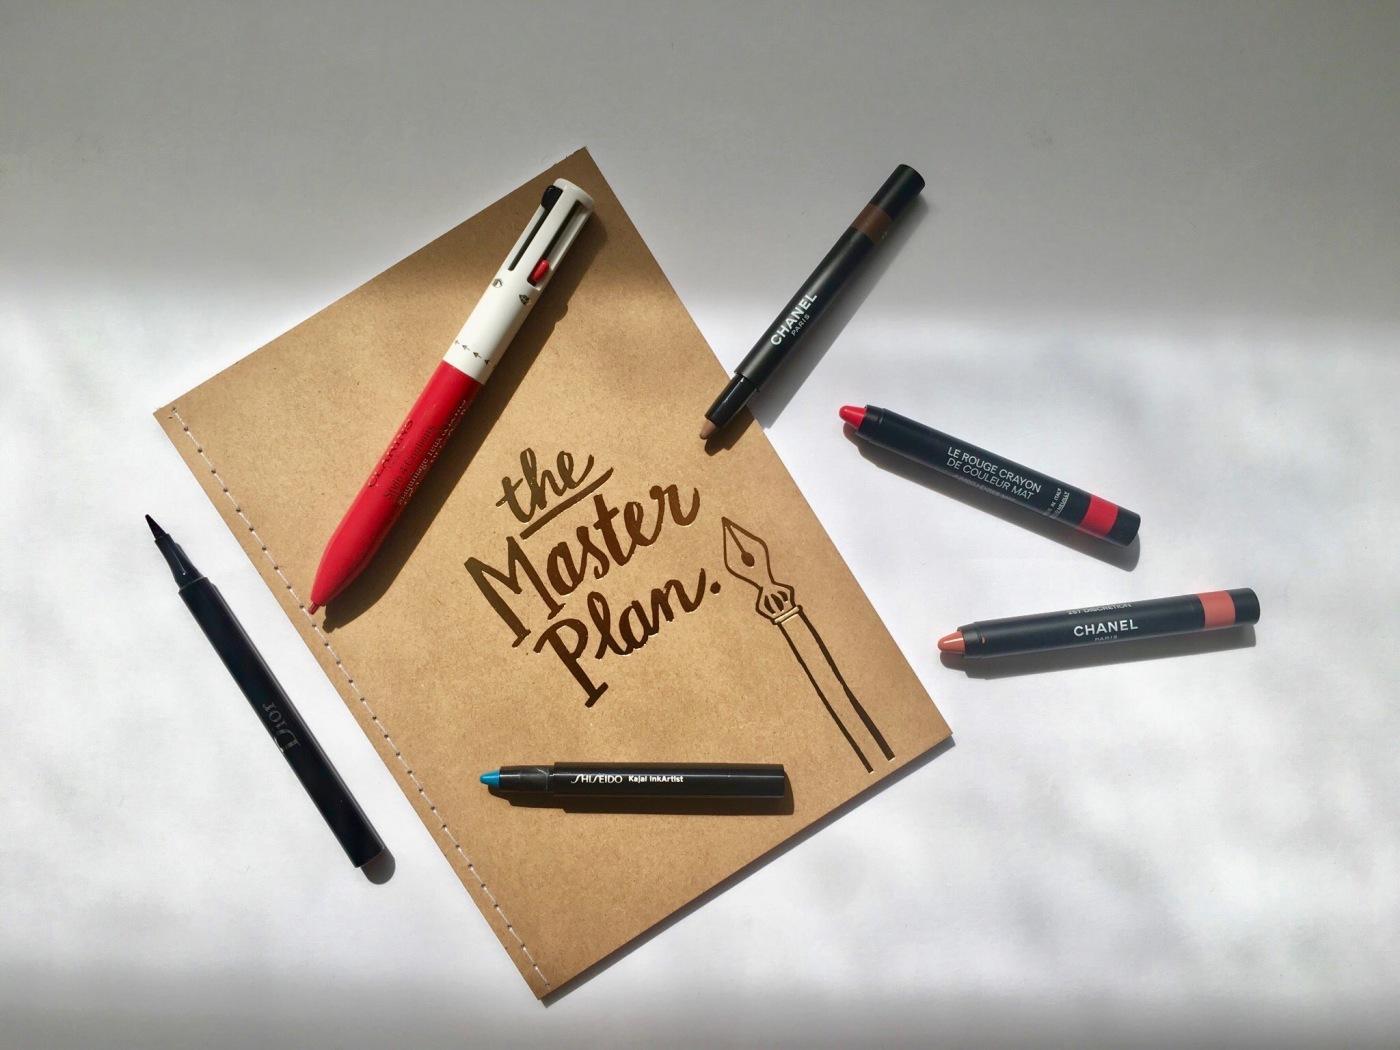 le rouge crayon chanel shiseido clarins dior